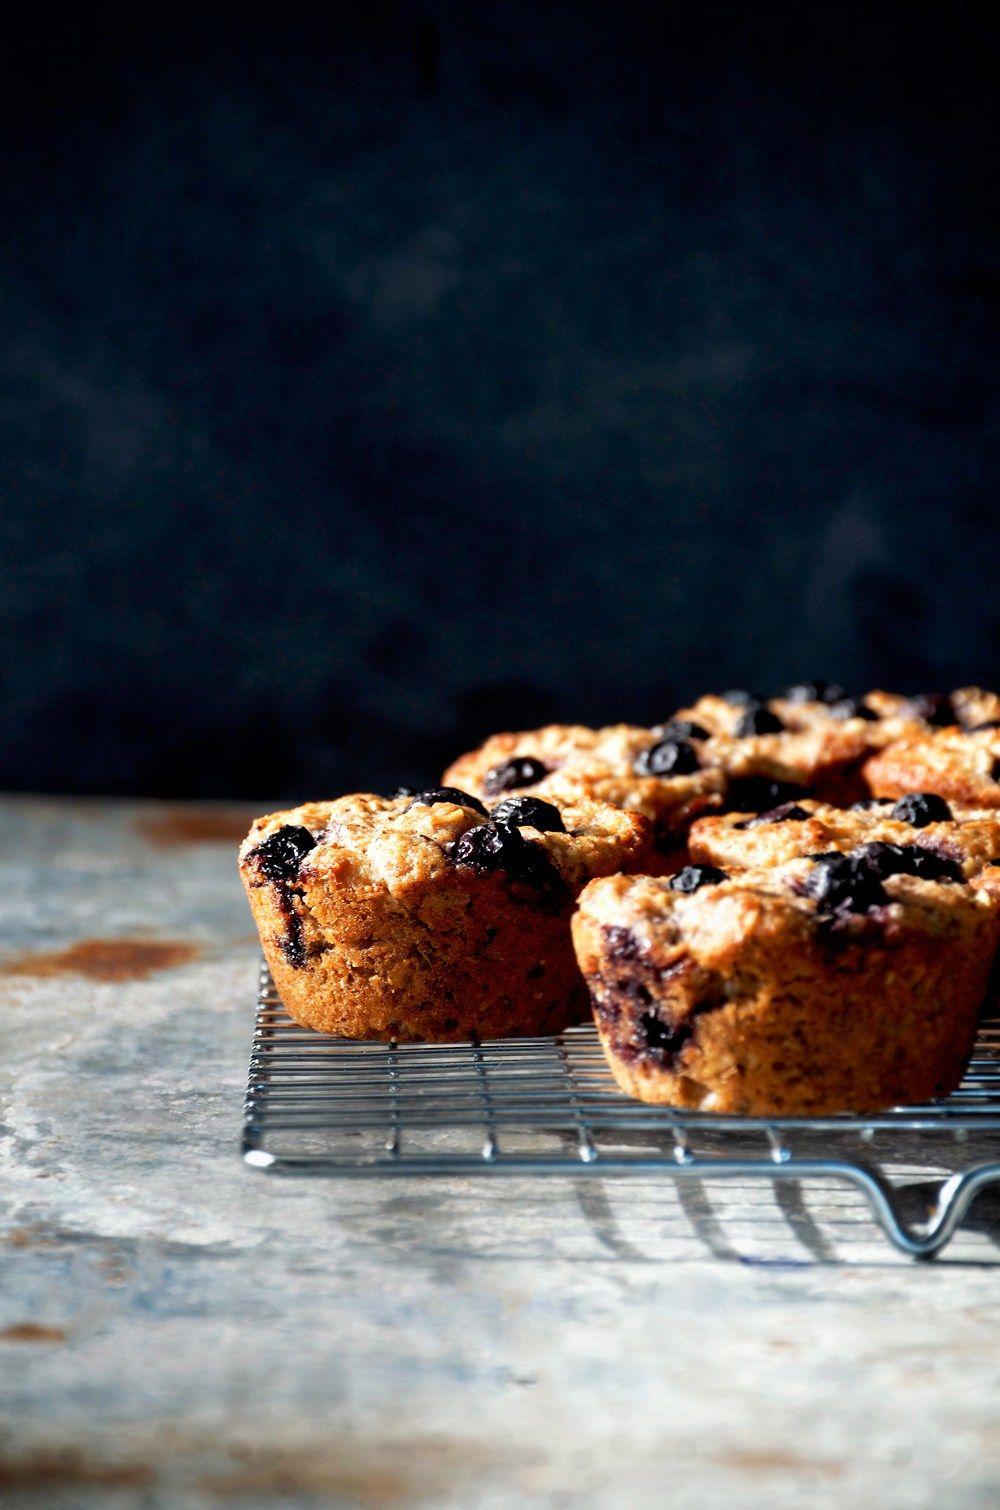 20 Yummy Vegan Breakfasts Leckere frühstücksideen